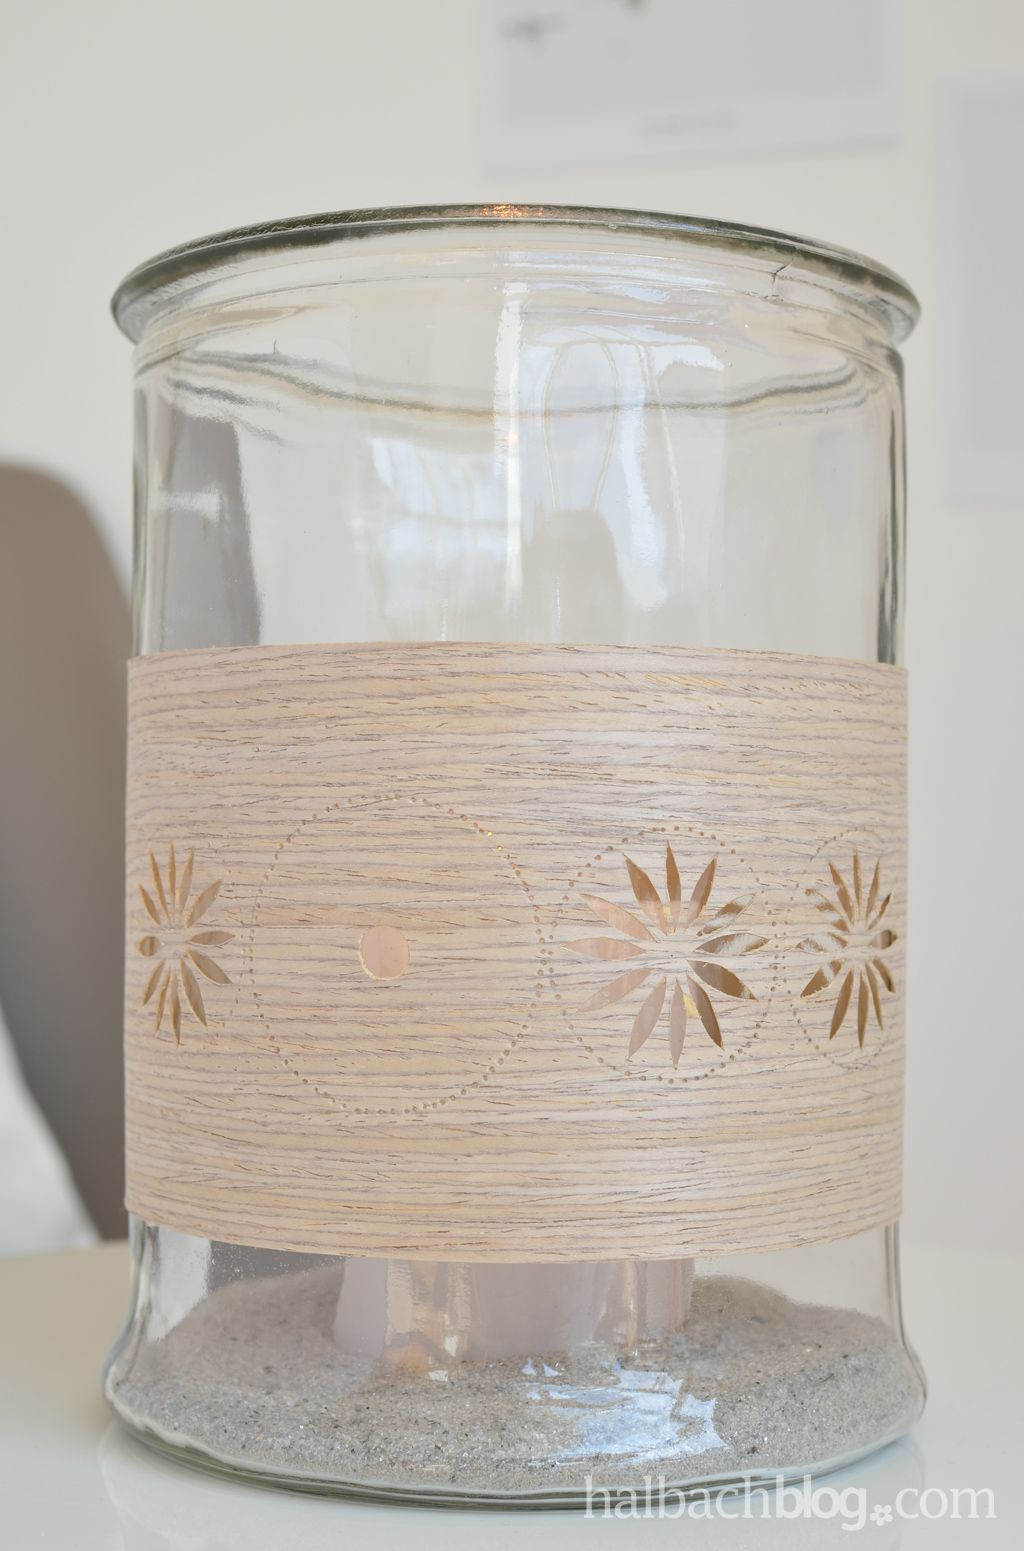 windlicht selber machen transparentpapier windlicht selber machen ideen f r teelichthalter aus. Black Bedroom Furniture Sets. Home Design Ideas